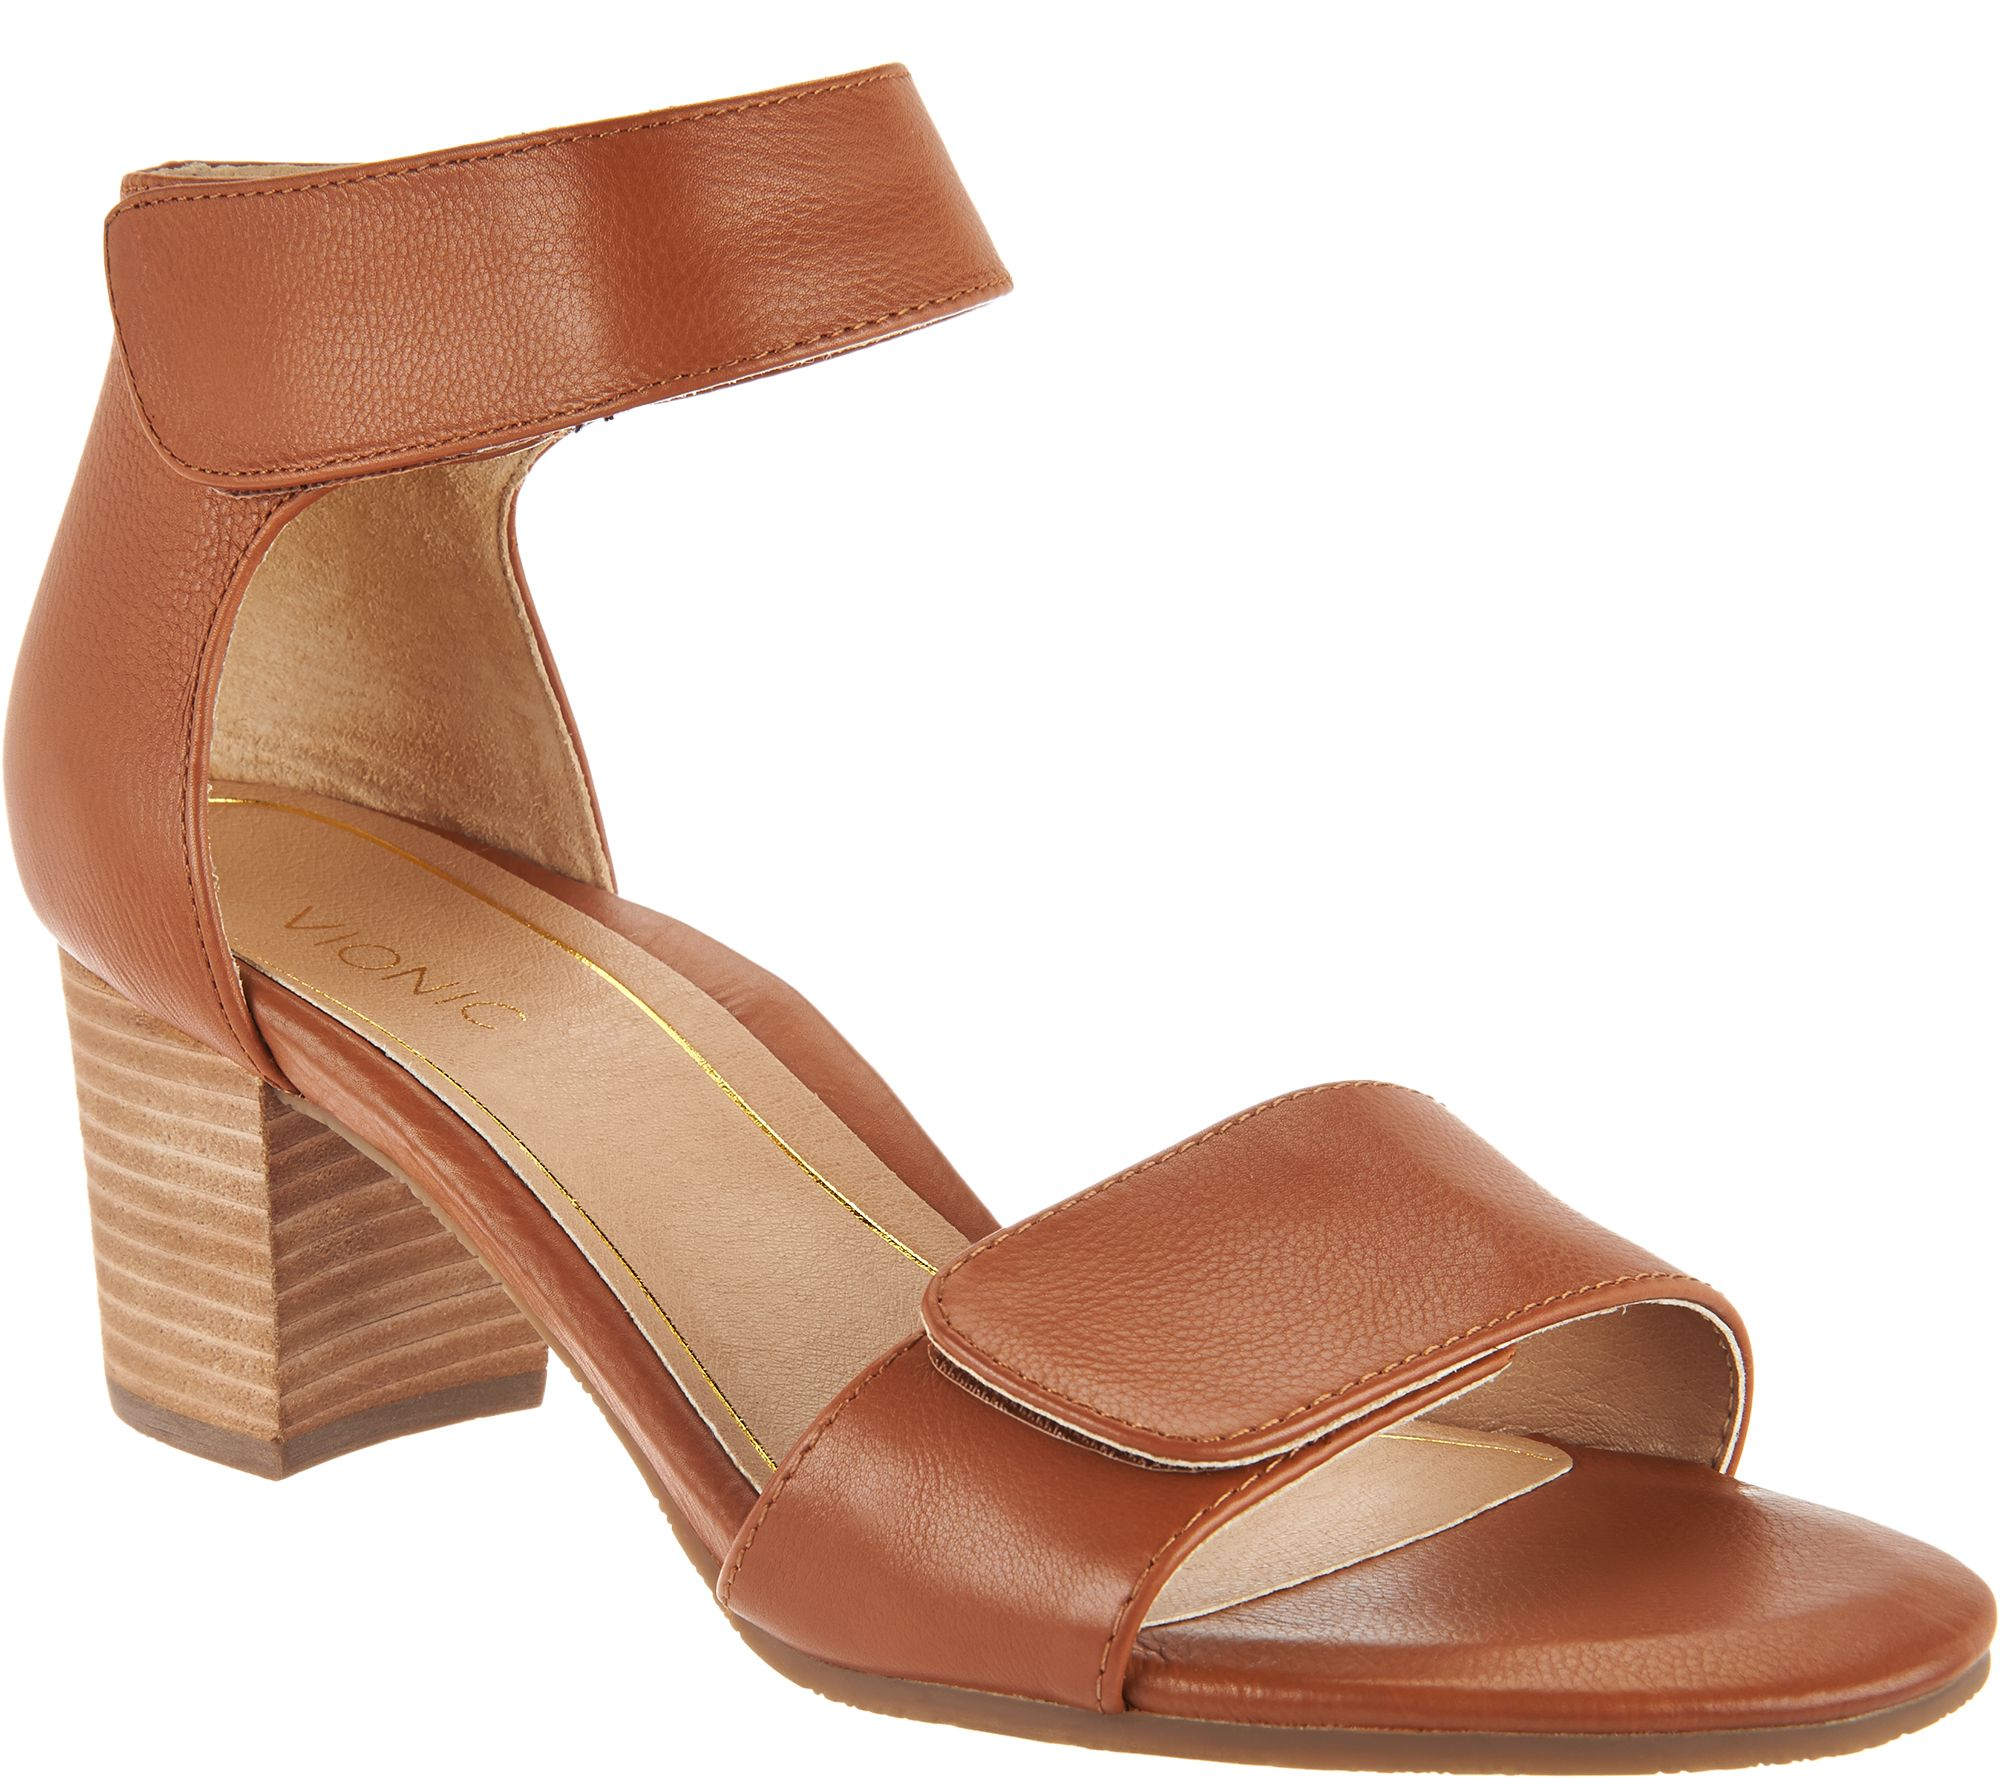 3491e926212f Vionic Block Heel Leather Sandals - Solana - Page 1 — QVC.com